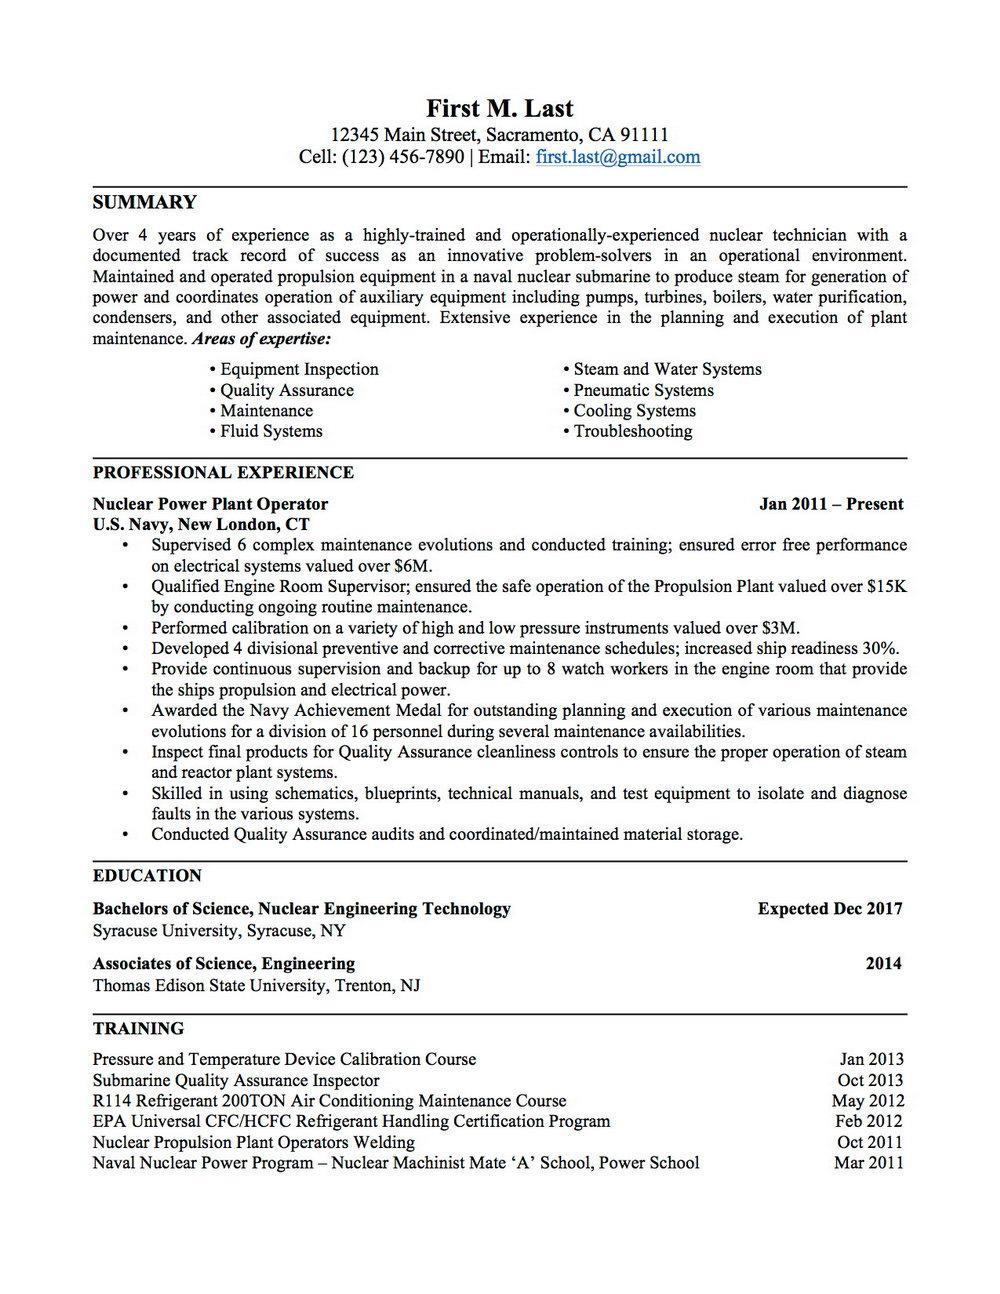 Military Resume For Civilian Job